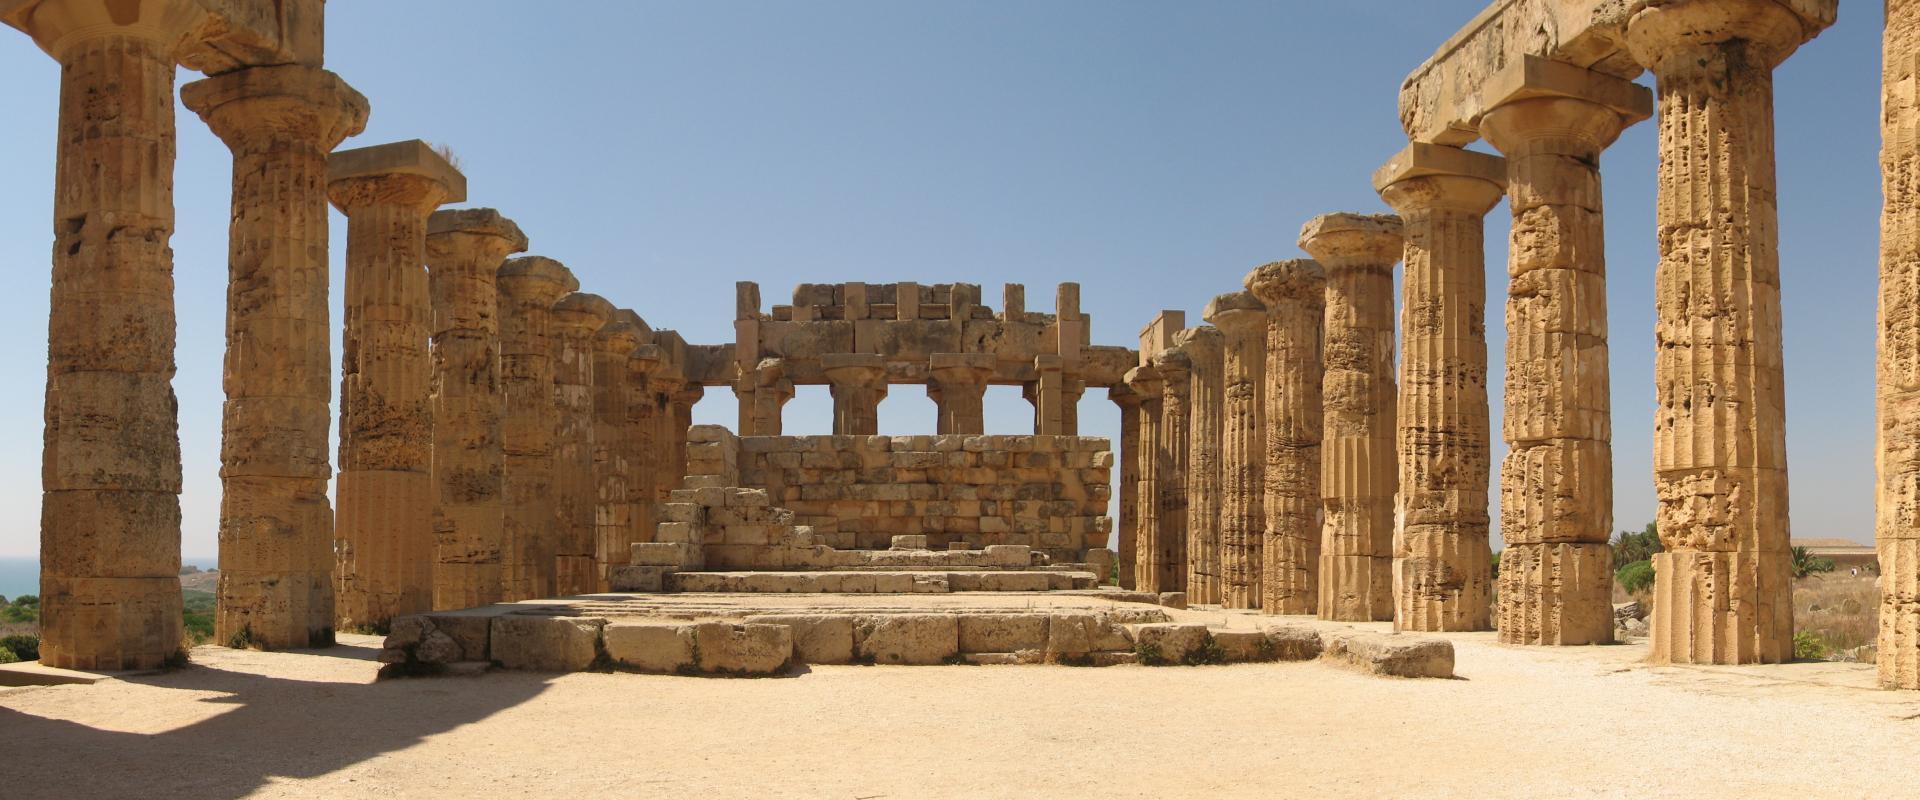 Visit of Selinunte